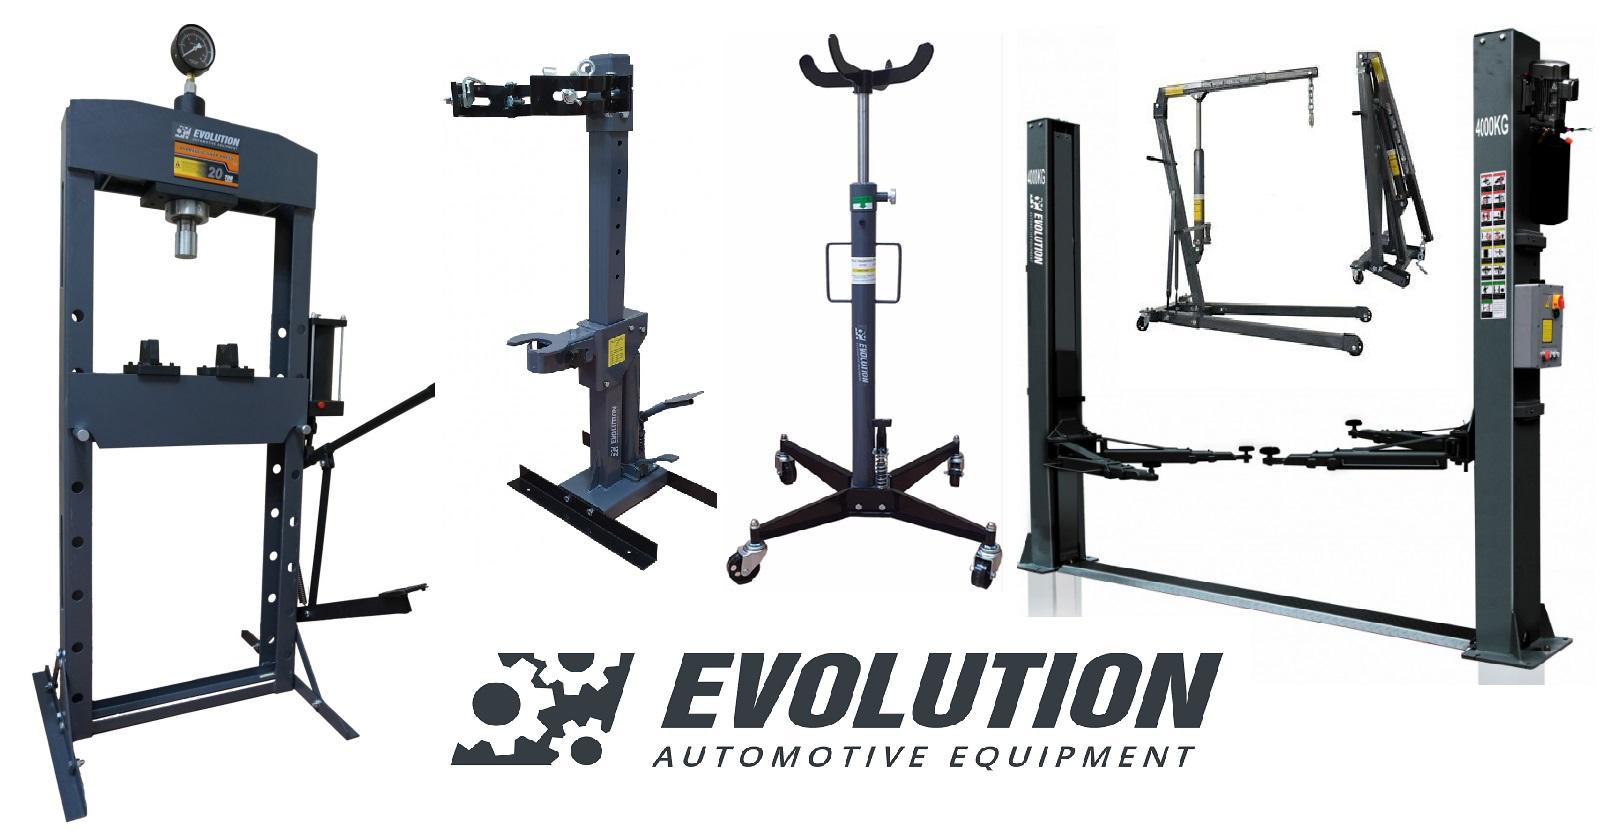 EVOLUTION PROFESSIONAL AUTOMOTIVE EQUIPMENT